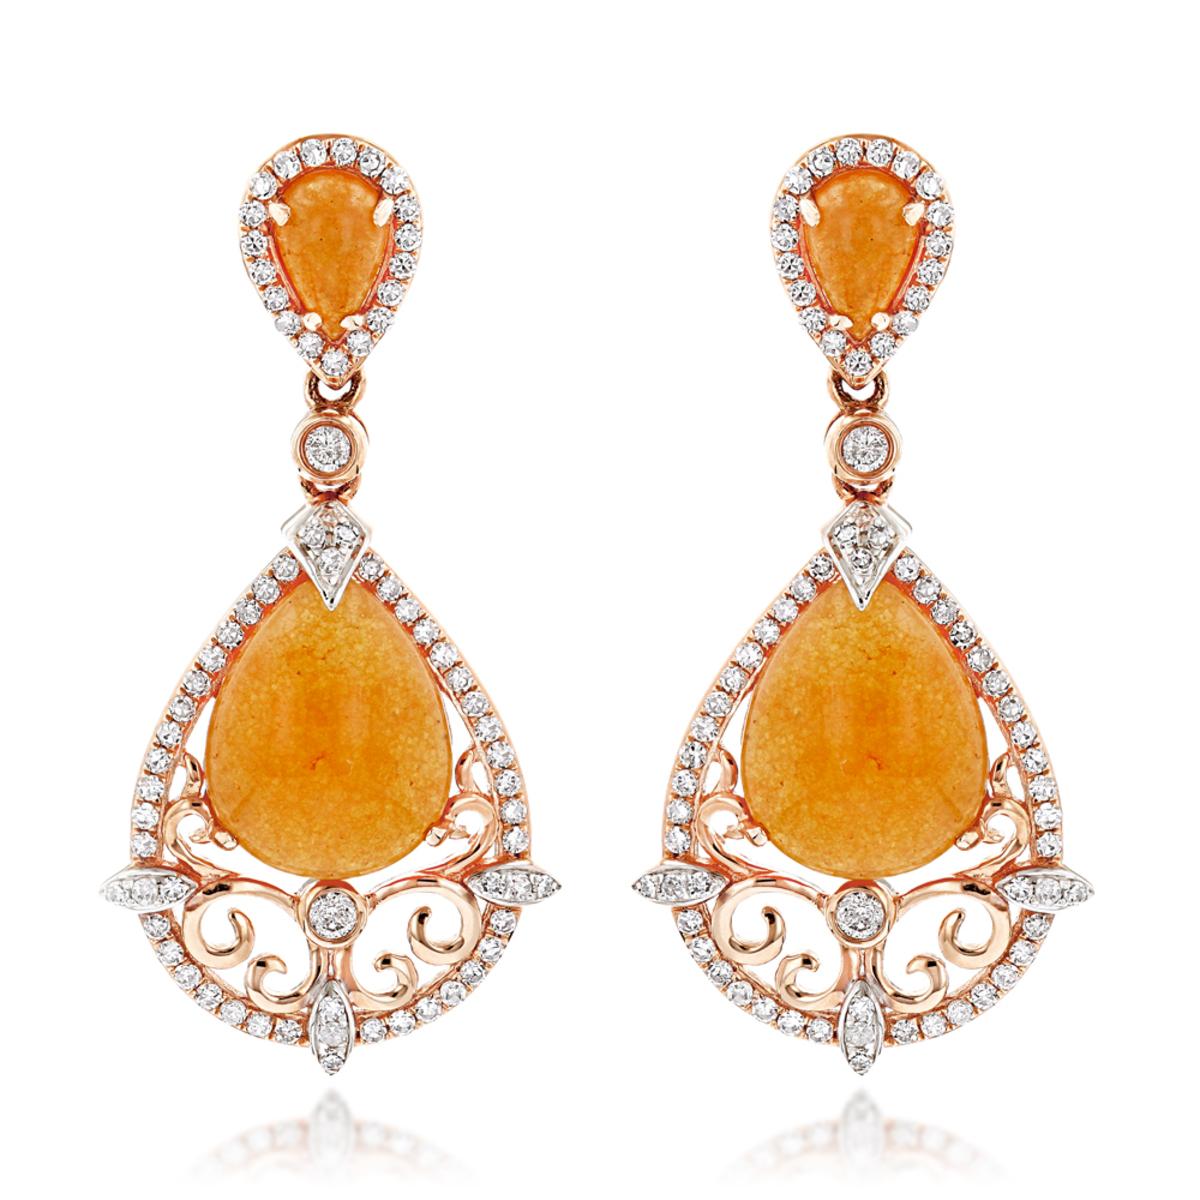 Orange Aventurine Gemstone Diamond Earrings 7.56ct 14K Gold